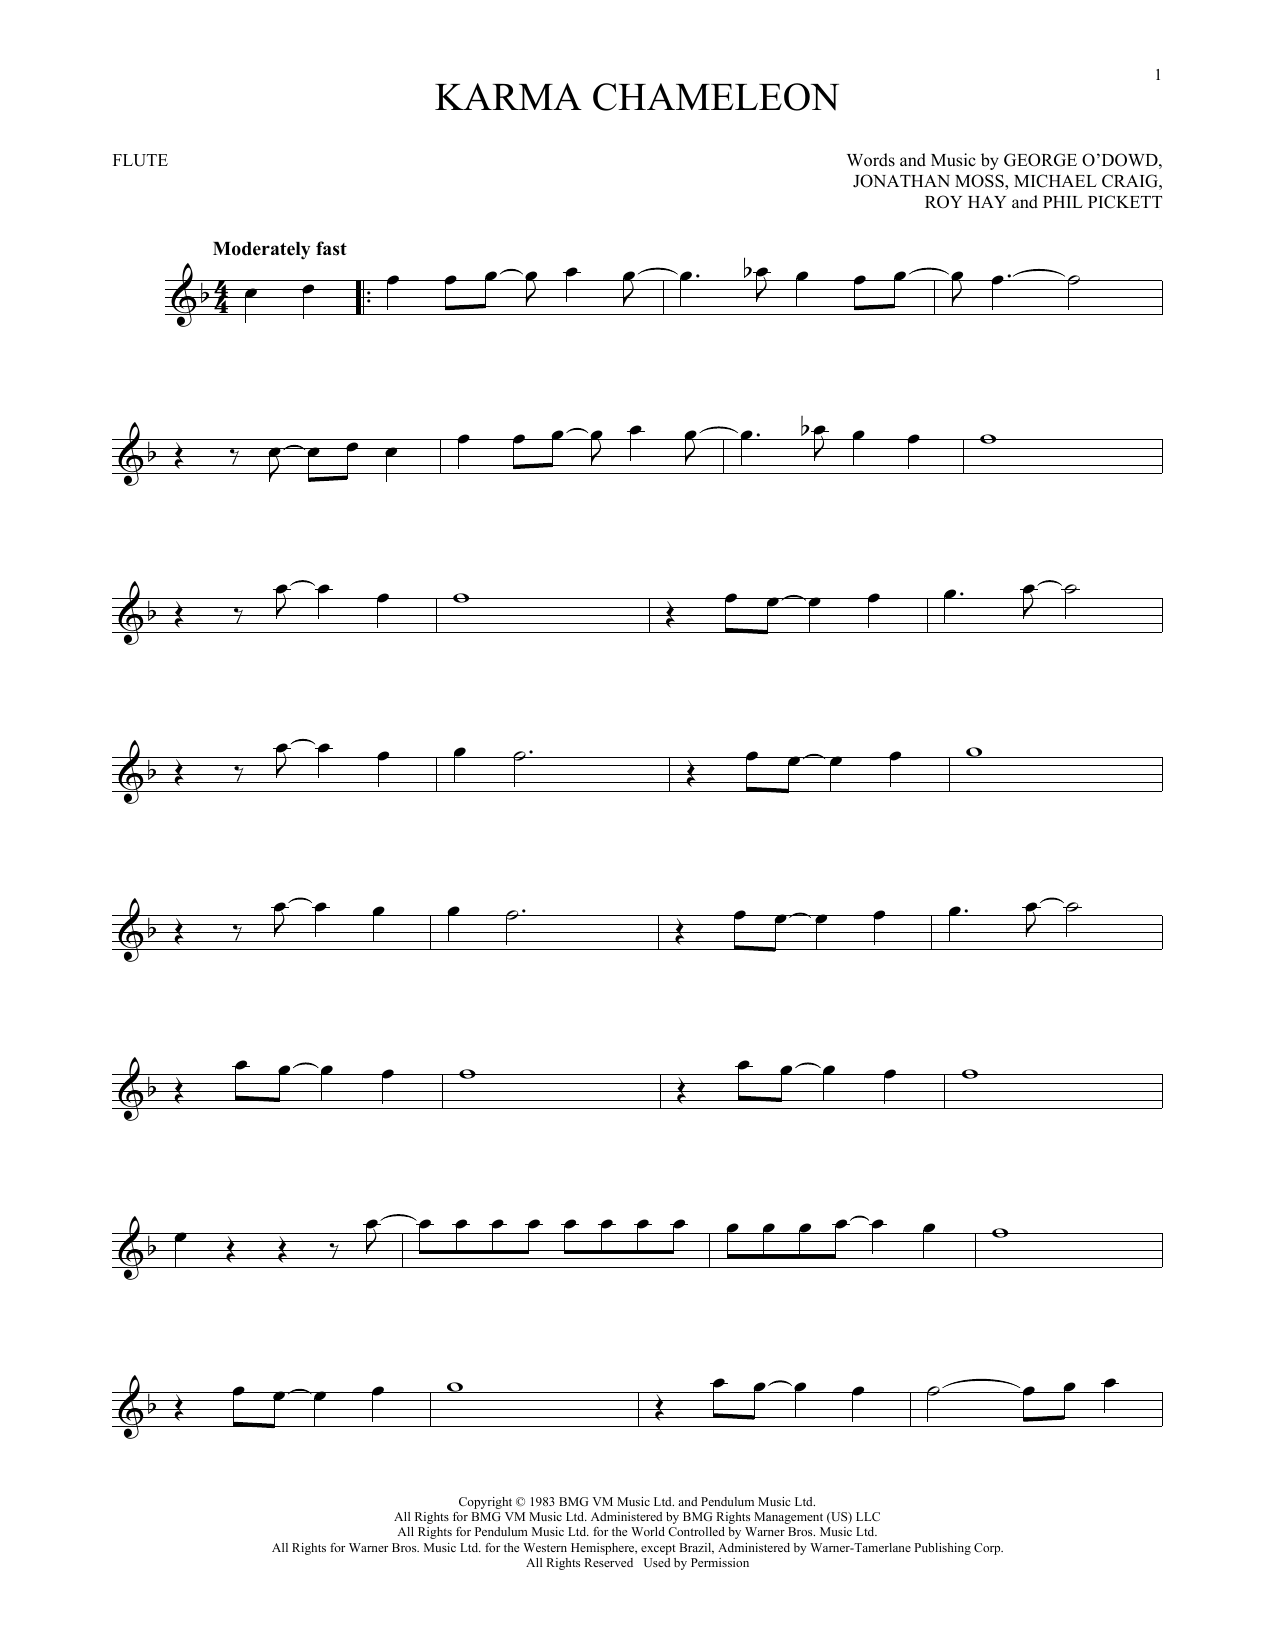 Karma Chameleon (Flute Solo)